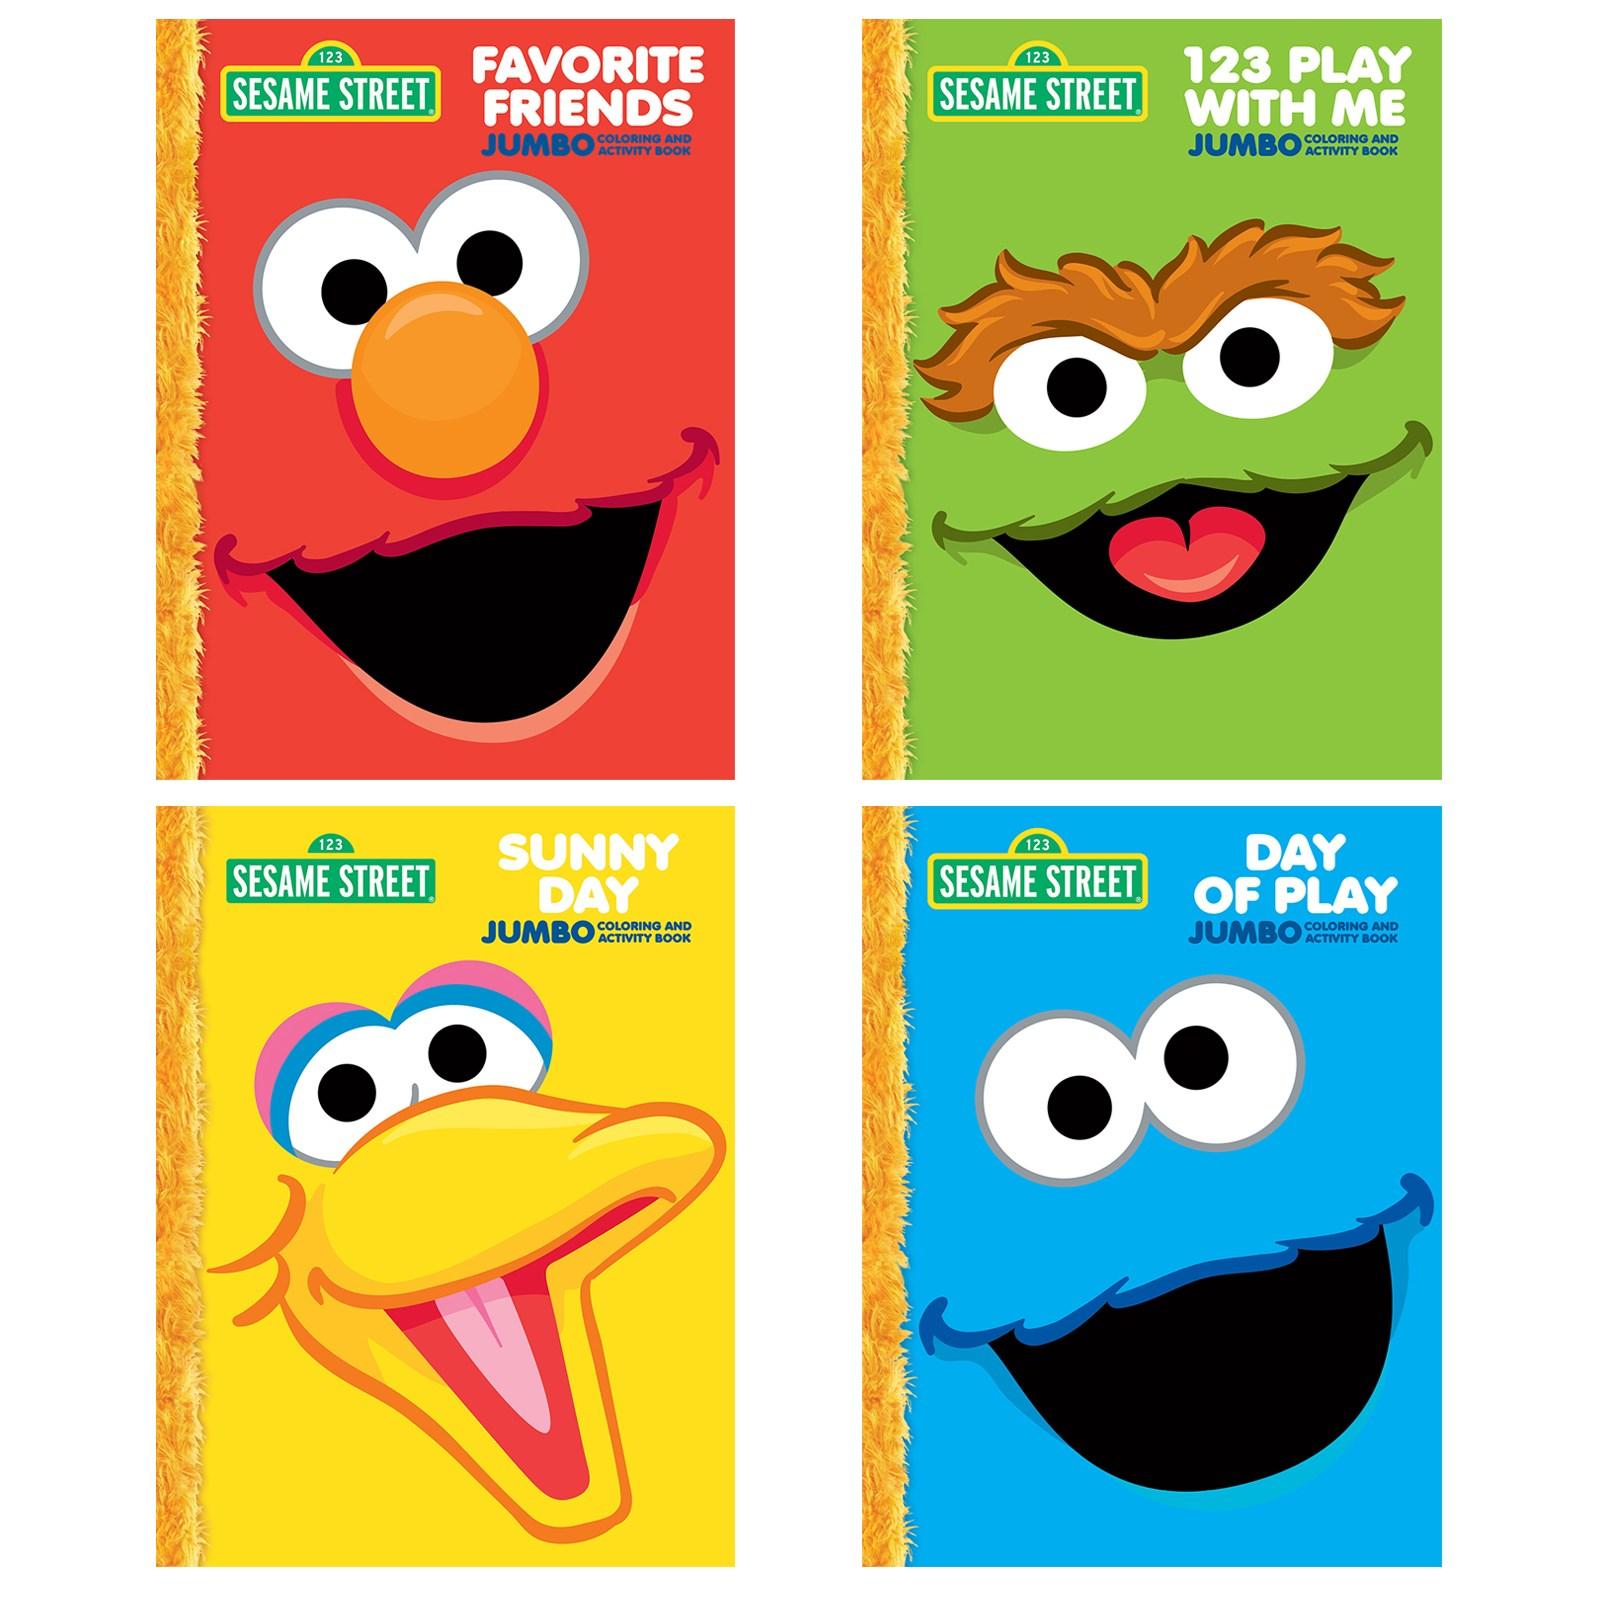 Image of Sesame Street Jumbo Activity Coloring Book